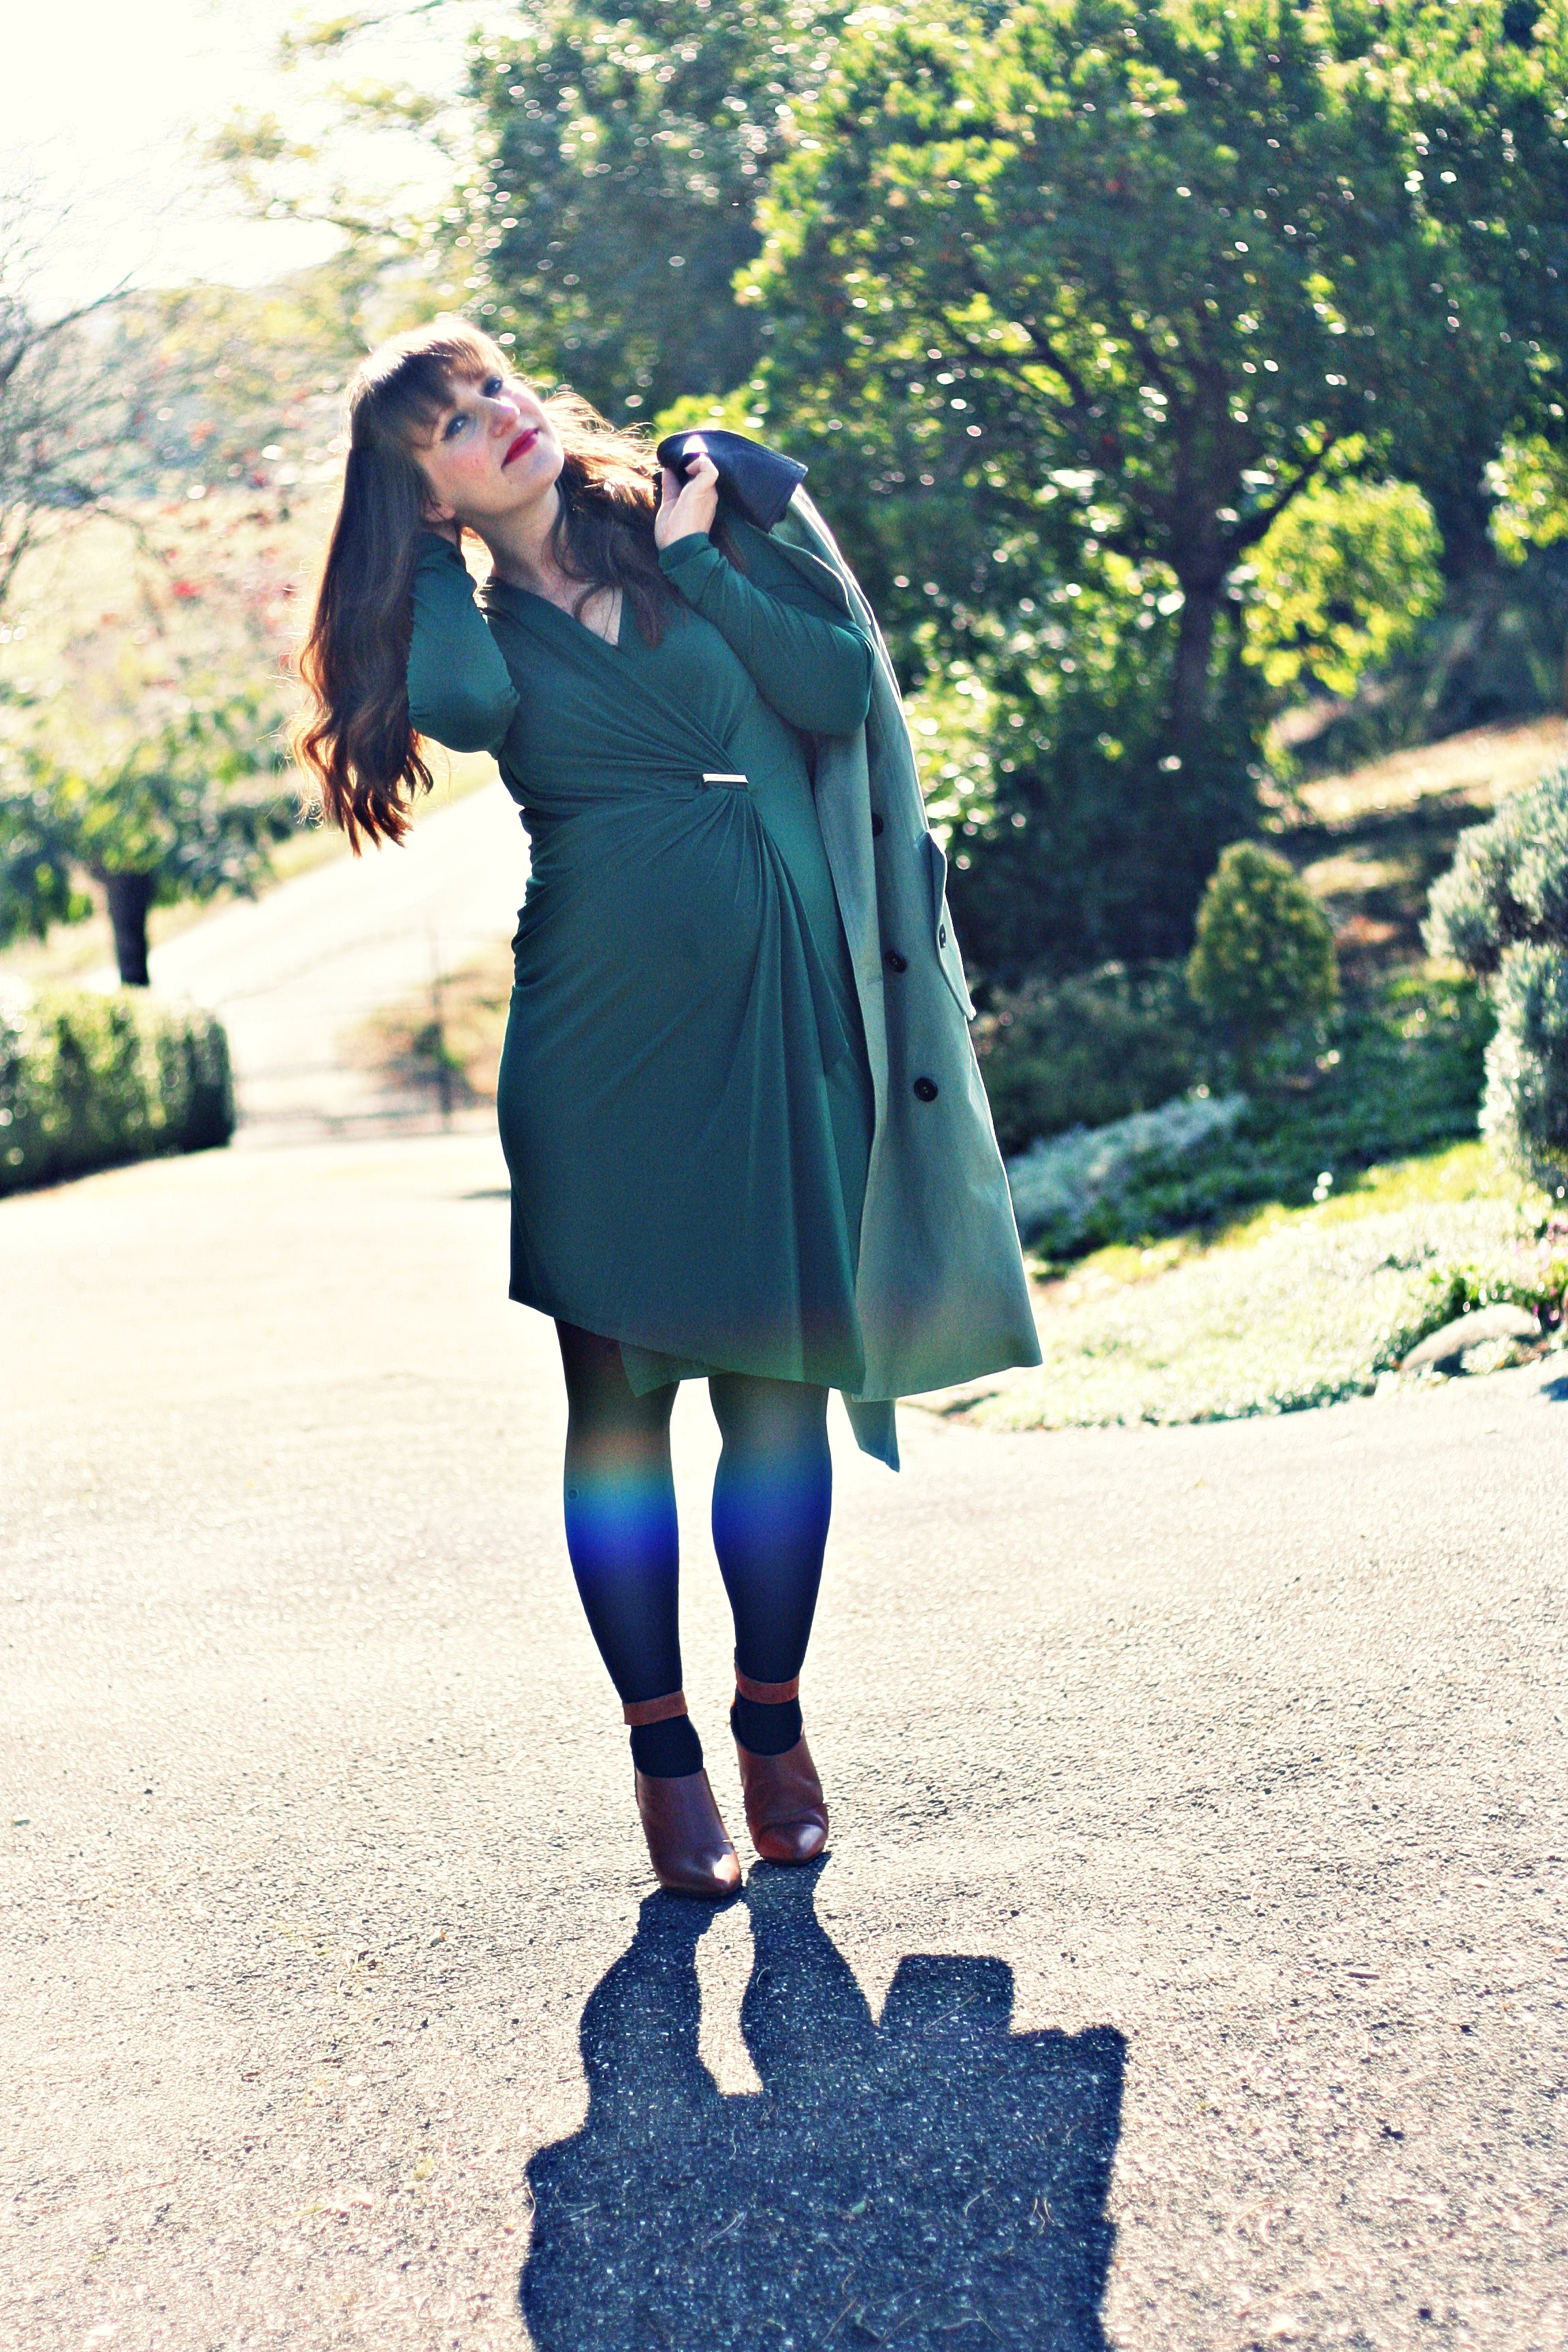 michael-kors-pret-a-porter-blog-femme-femme-enceinte-zign-boots-mint-berry